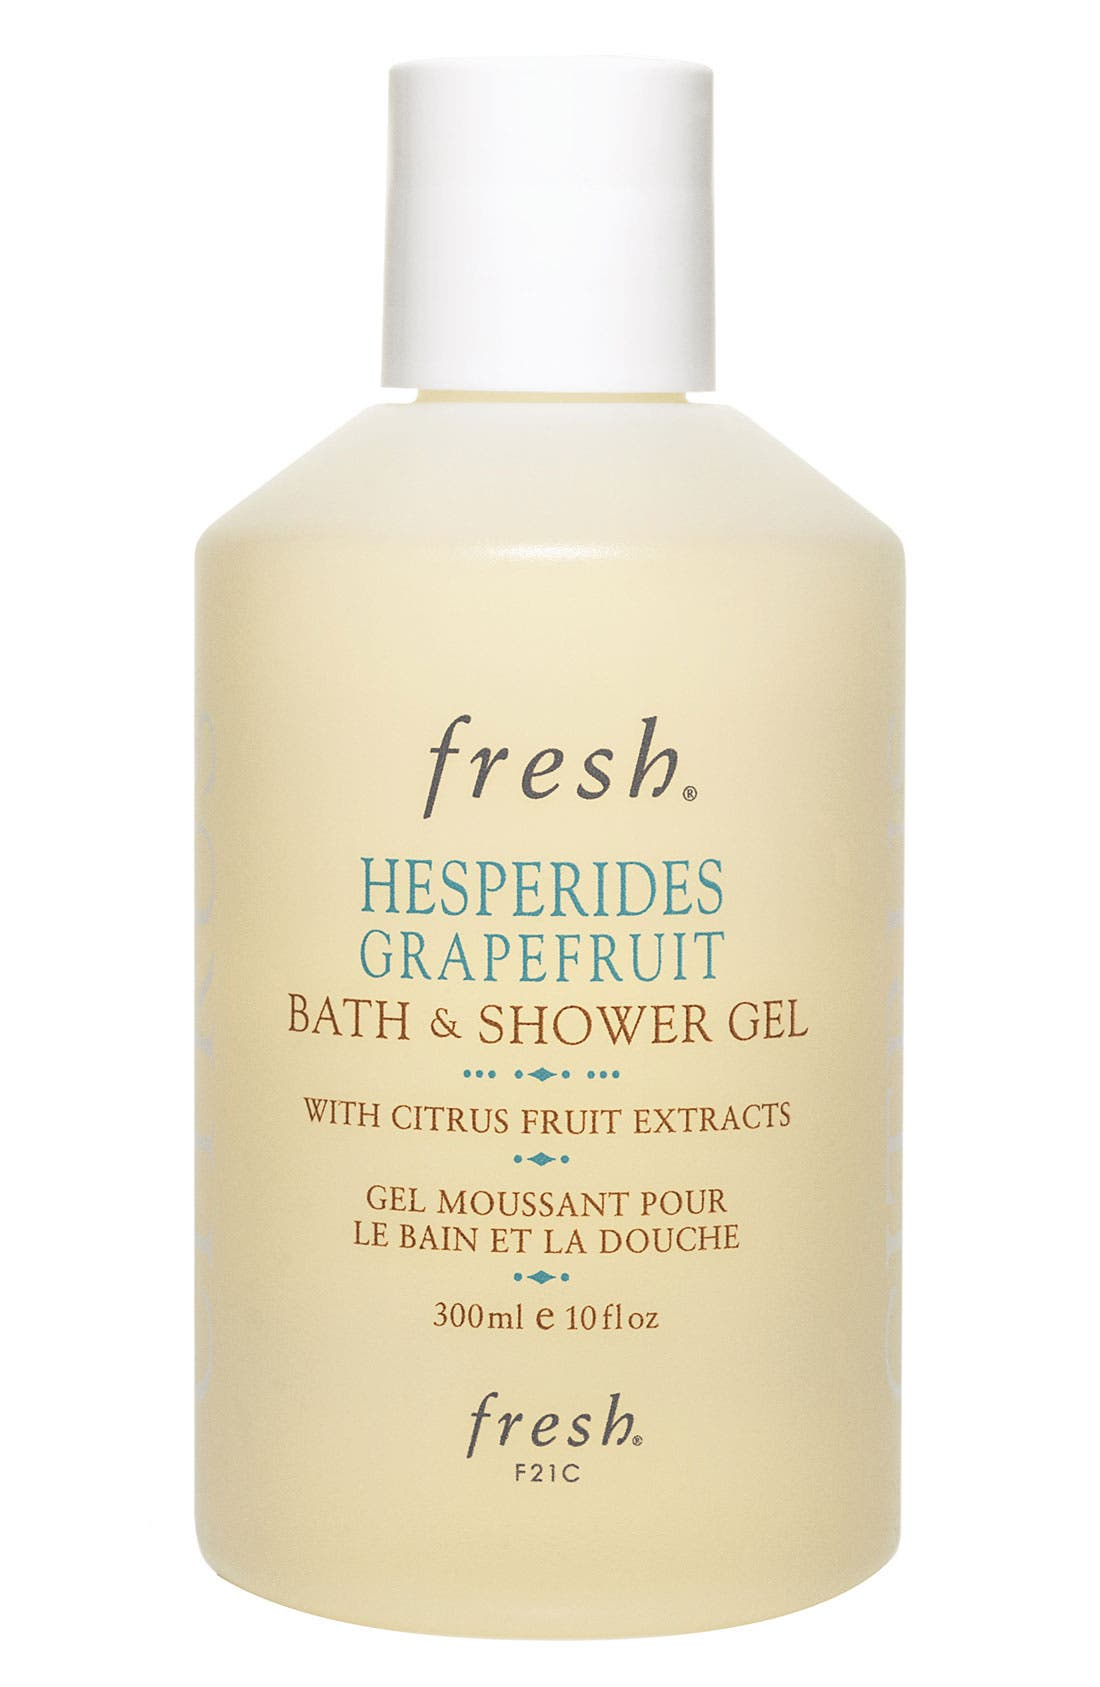 Fresh® 'Hesperides Grapefruit' Bath & Shower Gel